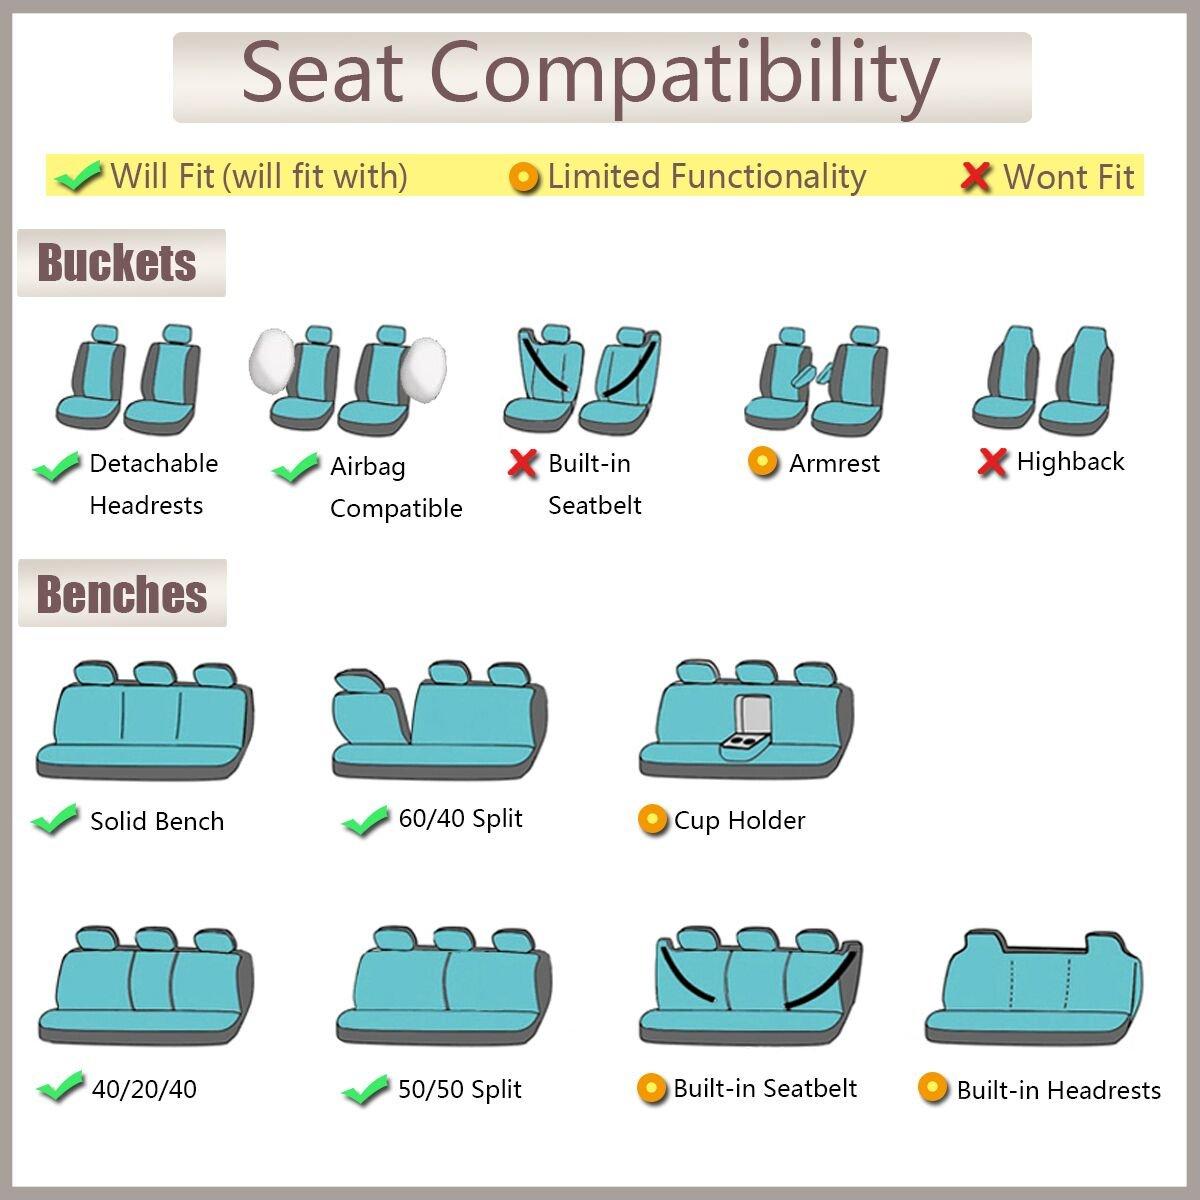 Ltd FB-104015-0303 Flying Banner 11 PCS Mesh and Jacquard Universal Full Set Car Seat Covers with Side Airbags Ningbo Qiyang International Trade Co 11 PCS , Beige Full Set